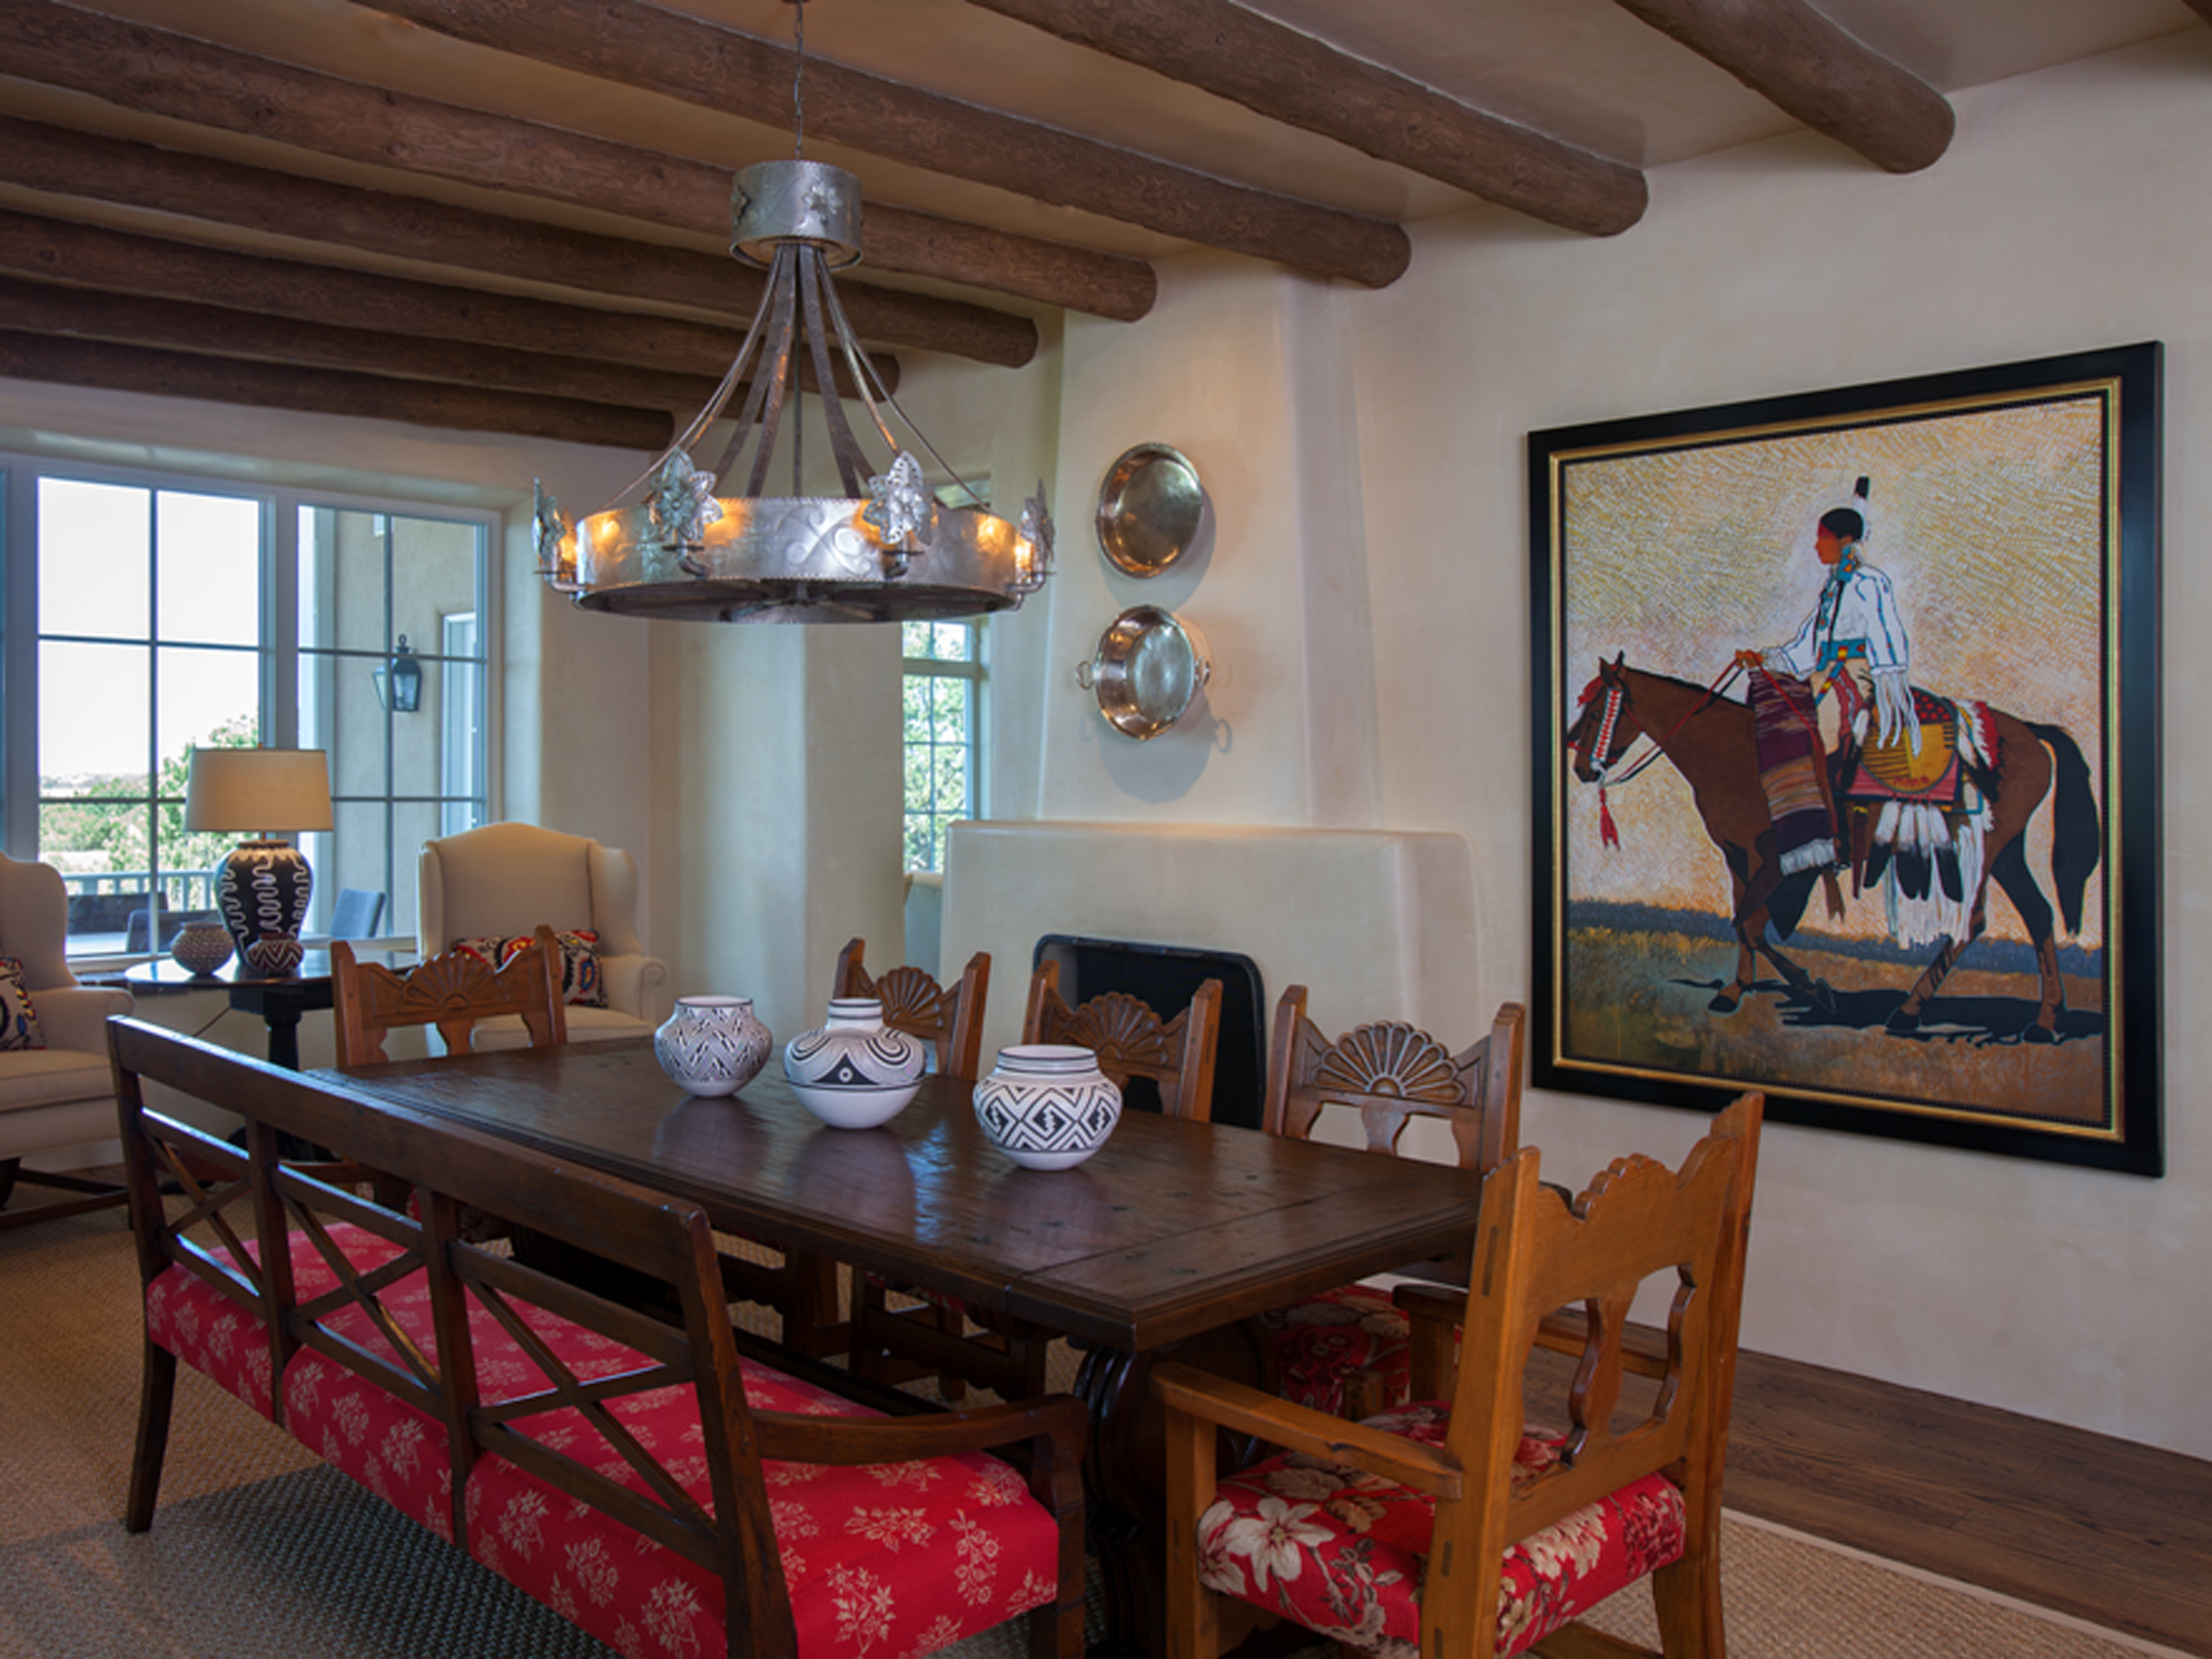 Santa Fe New Mexico Adobe Home Southwestern Decorating Ideas - Adobe home design